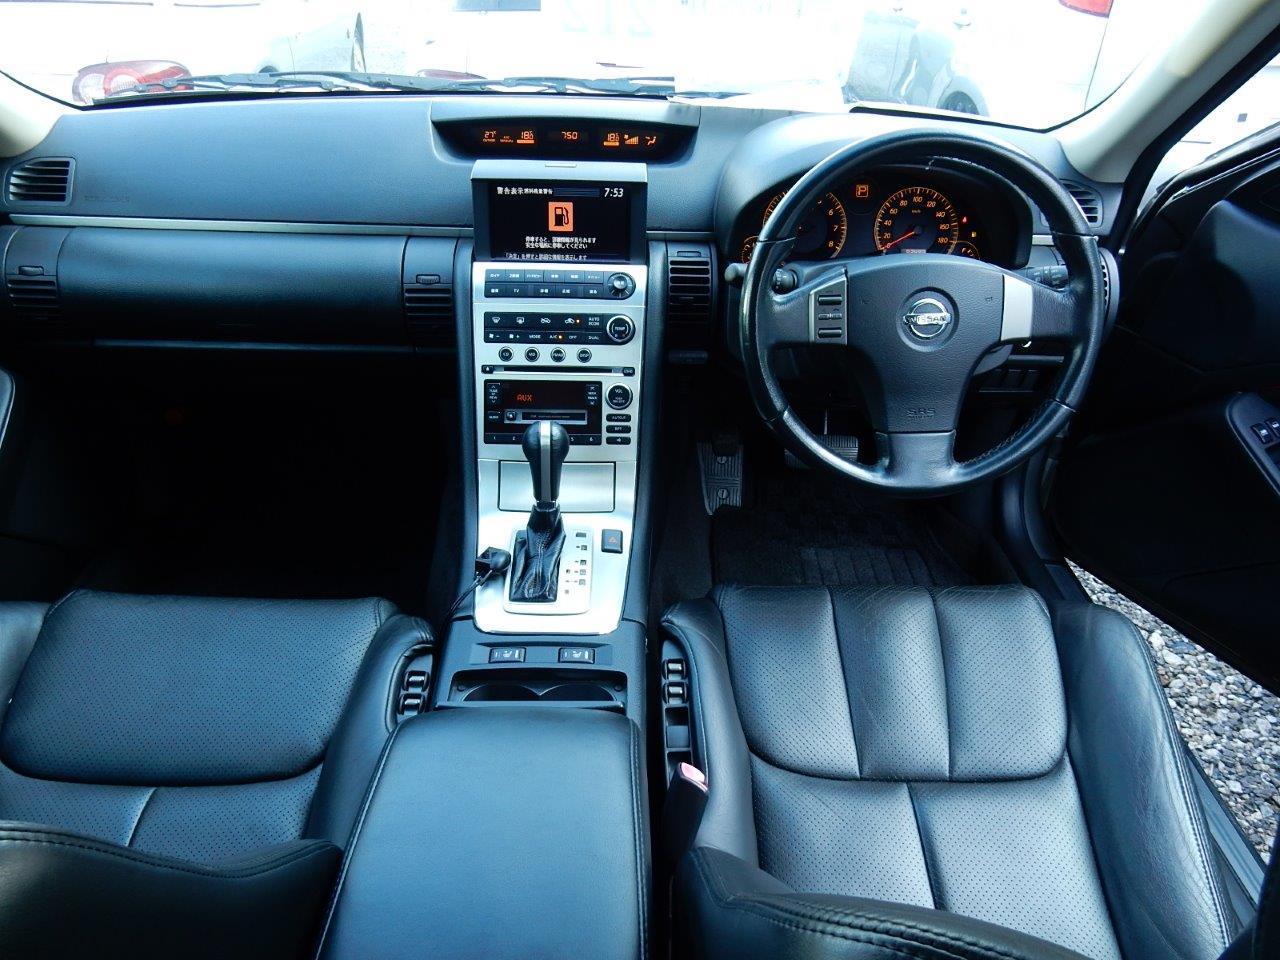 2004 Nissan Stagea AR-X interior